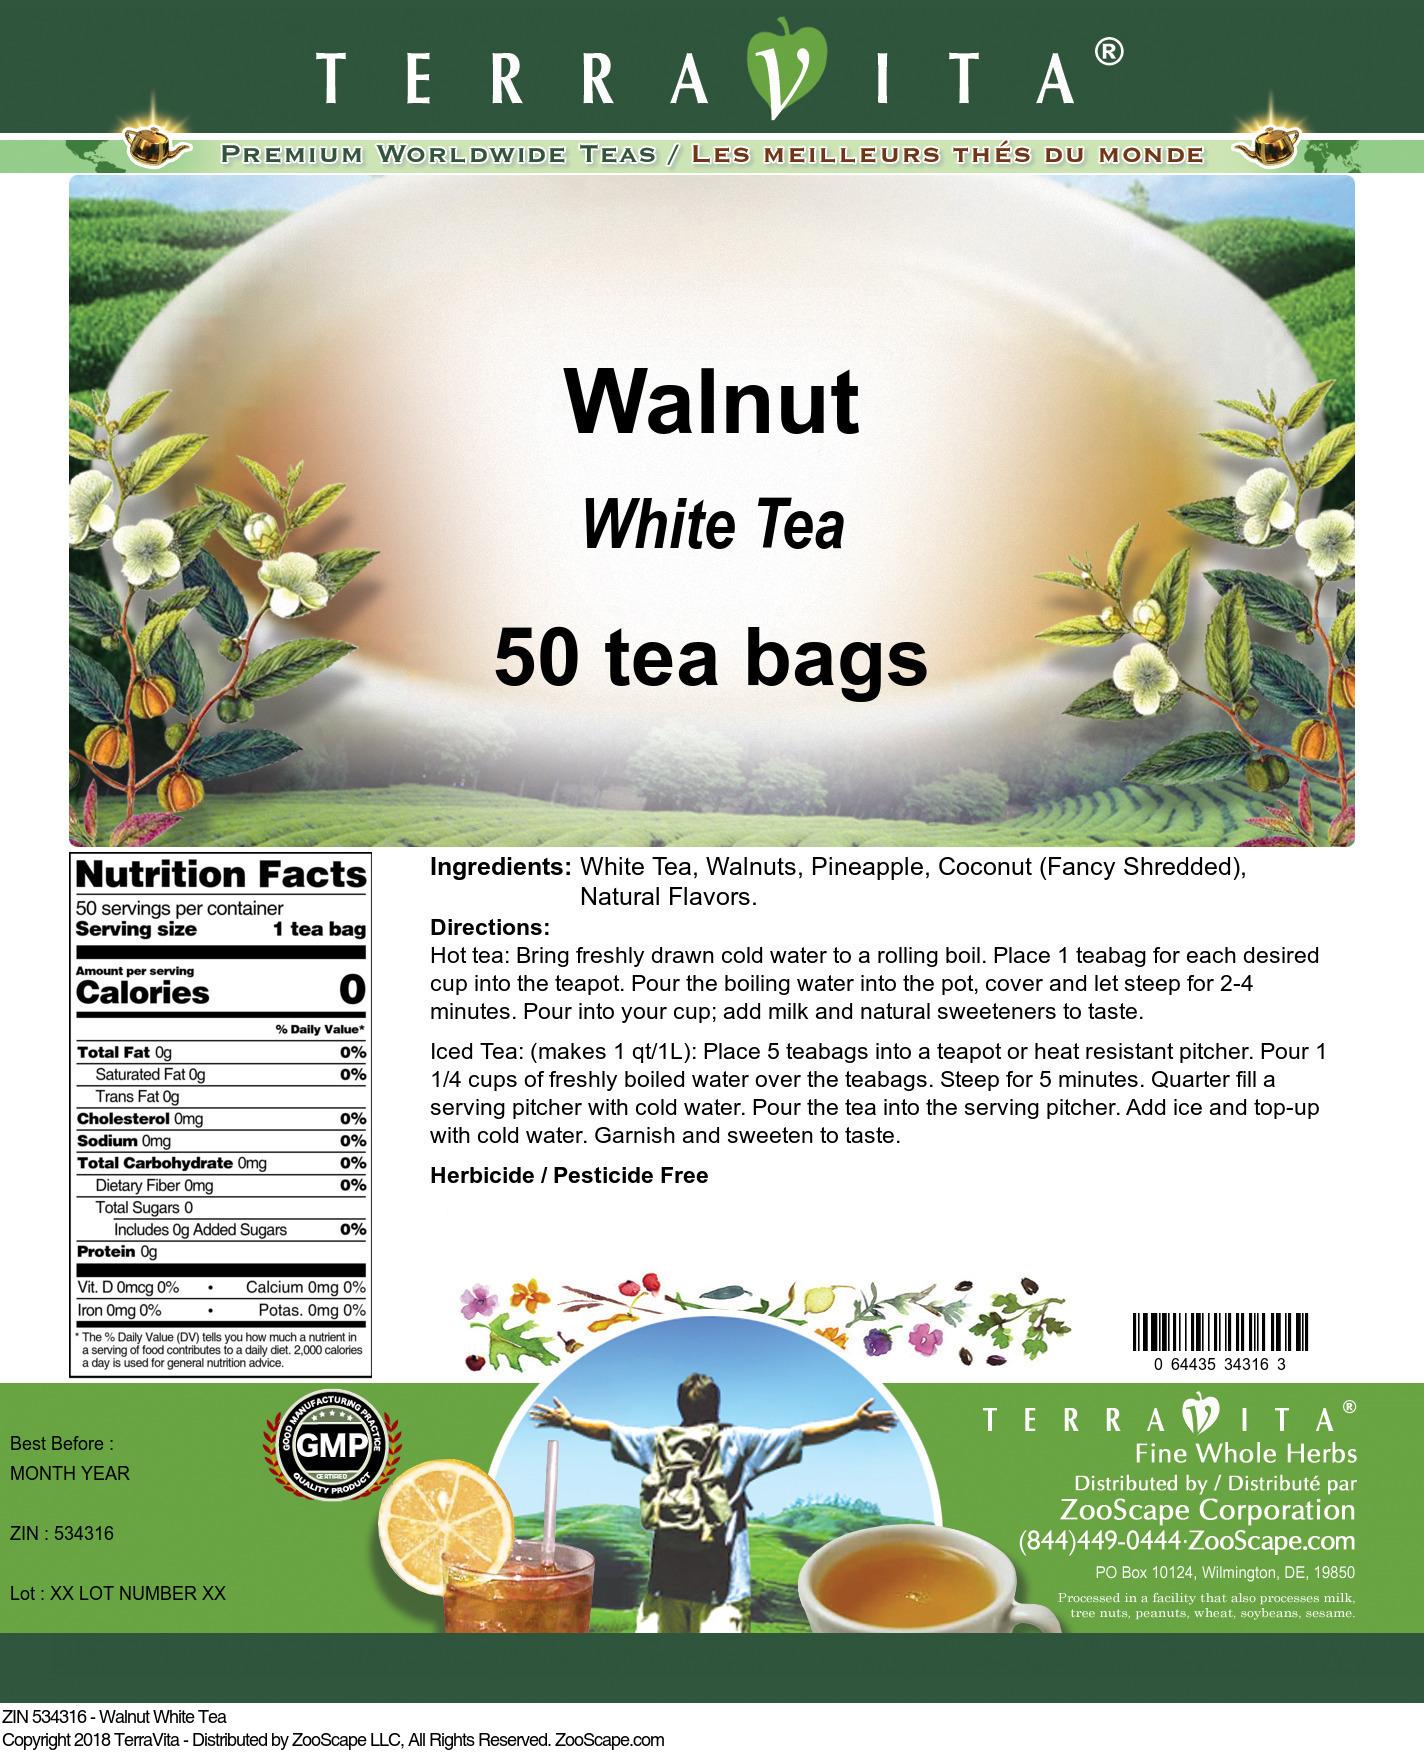 Walnut White Tea